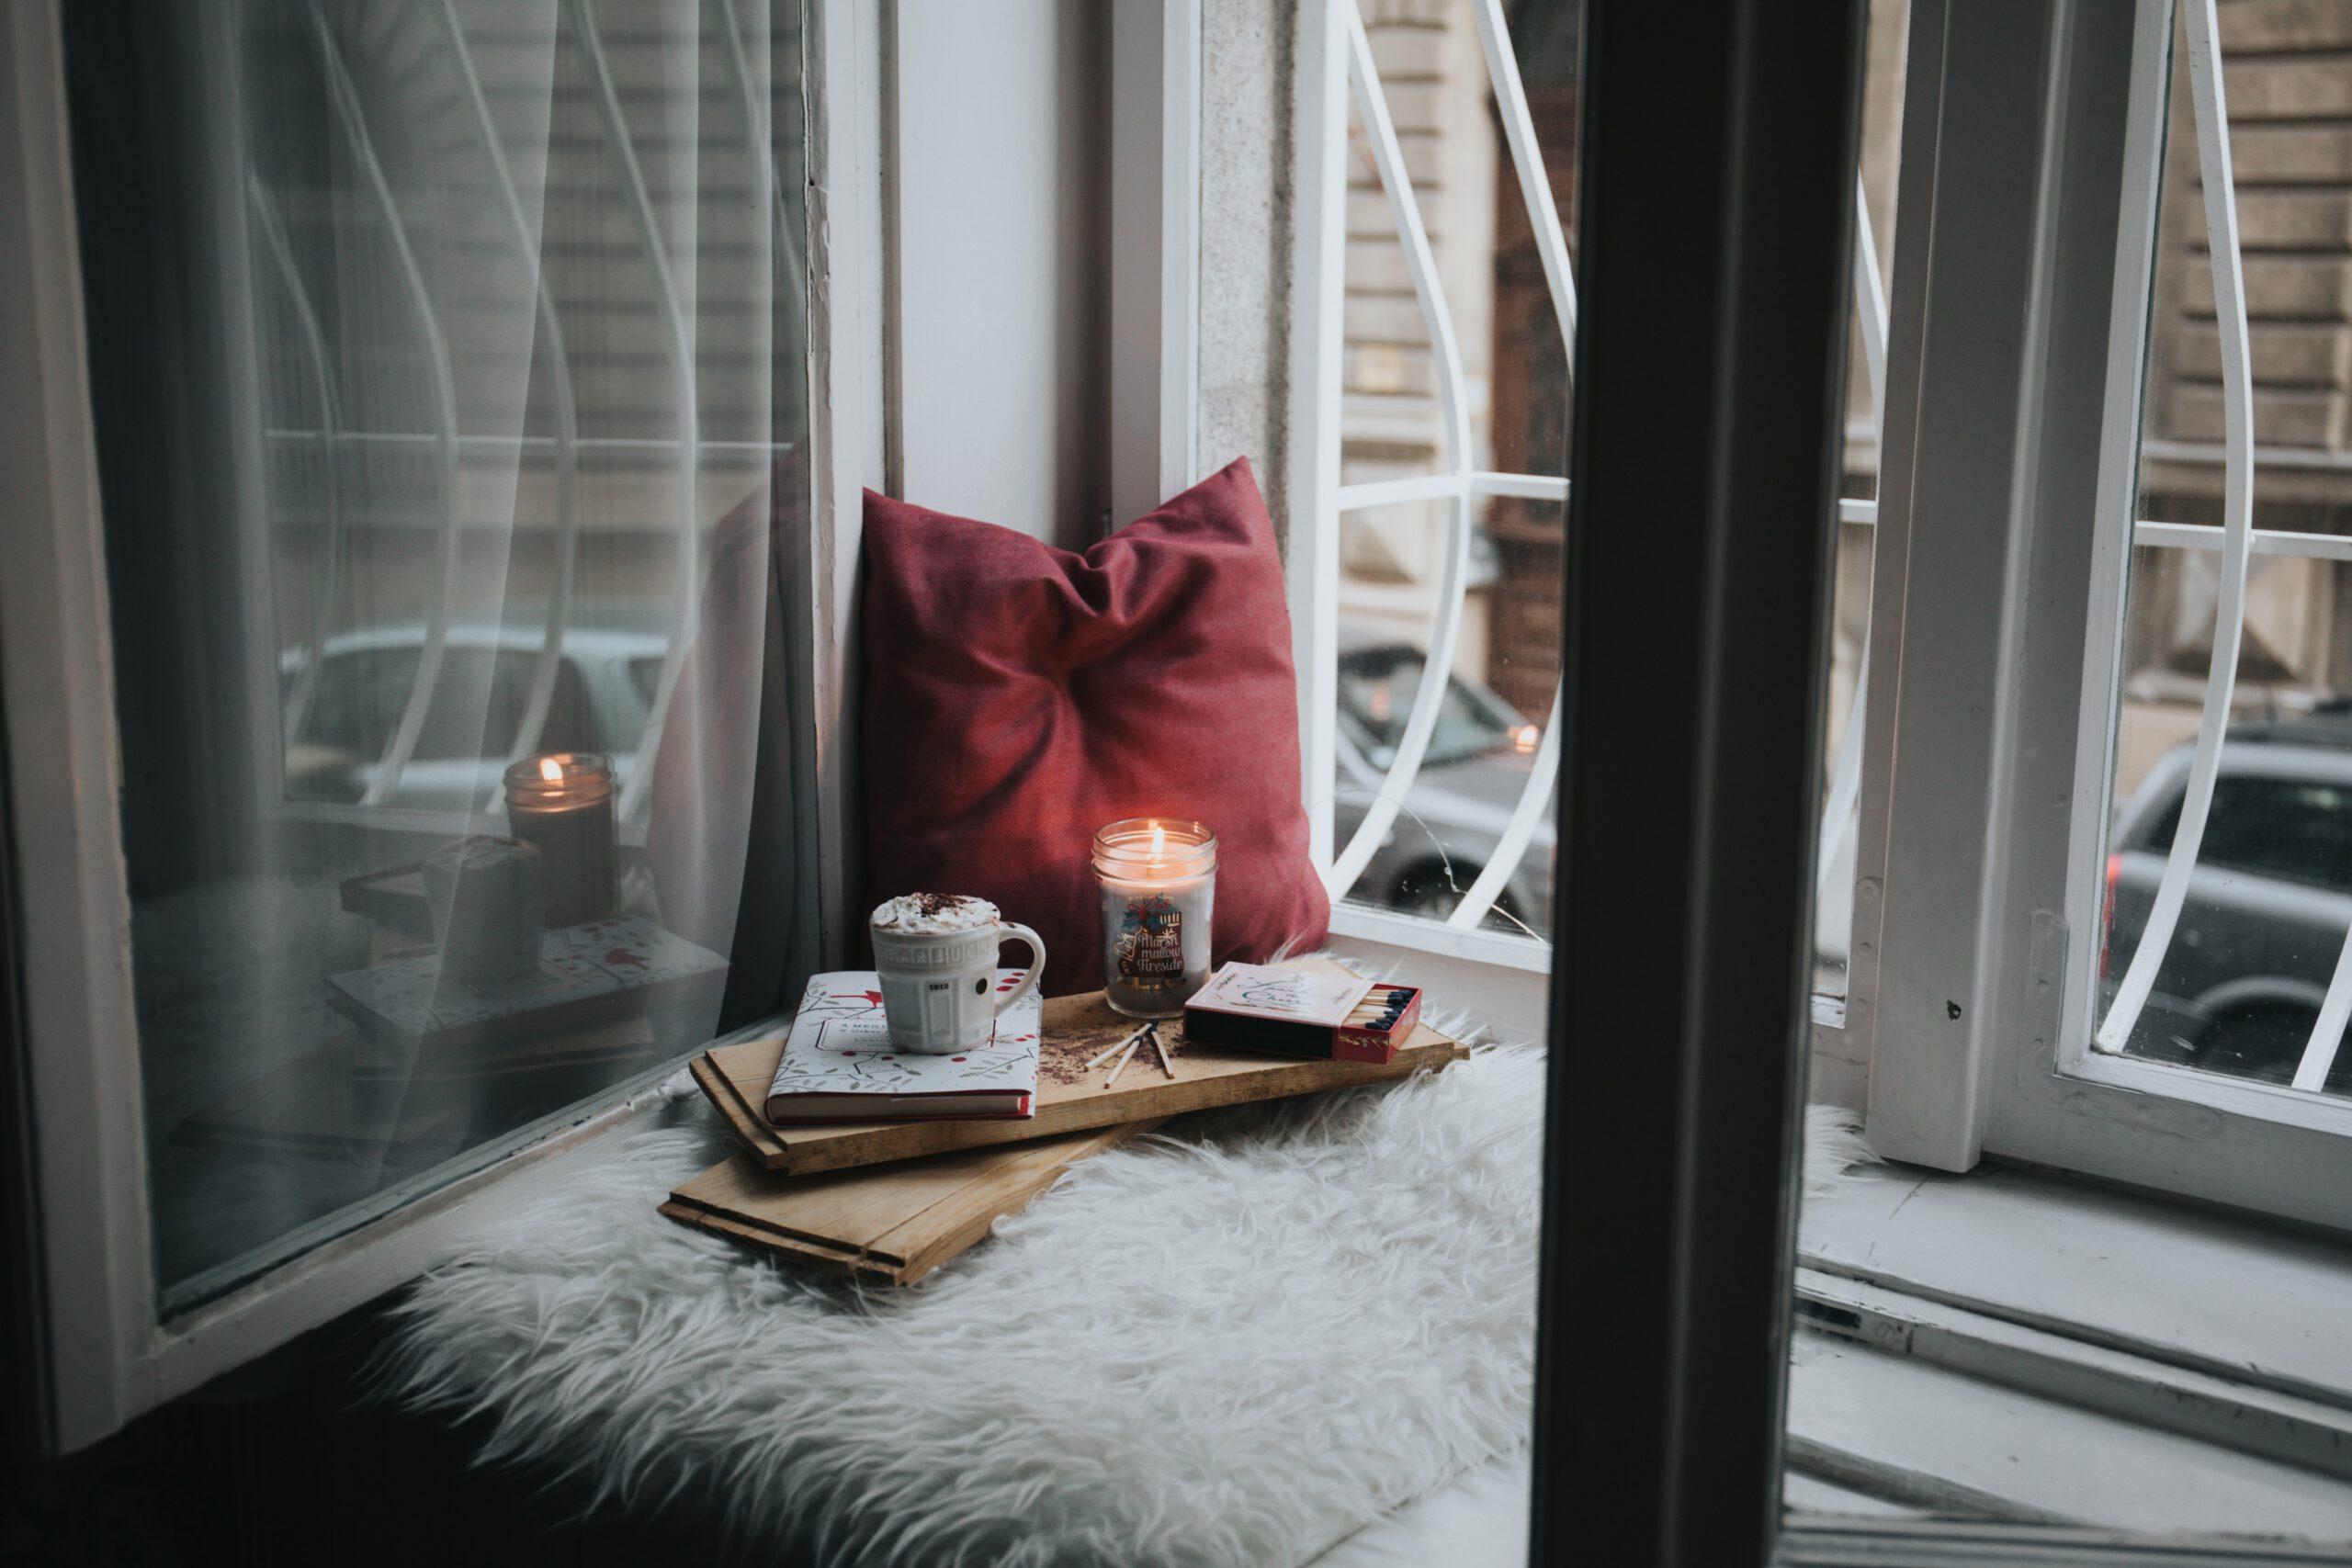 31 self-care ideas for winter